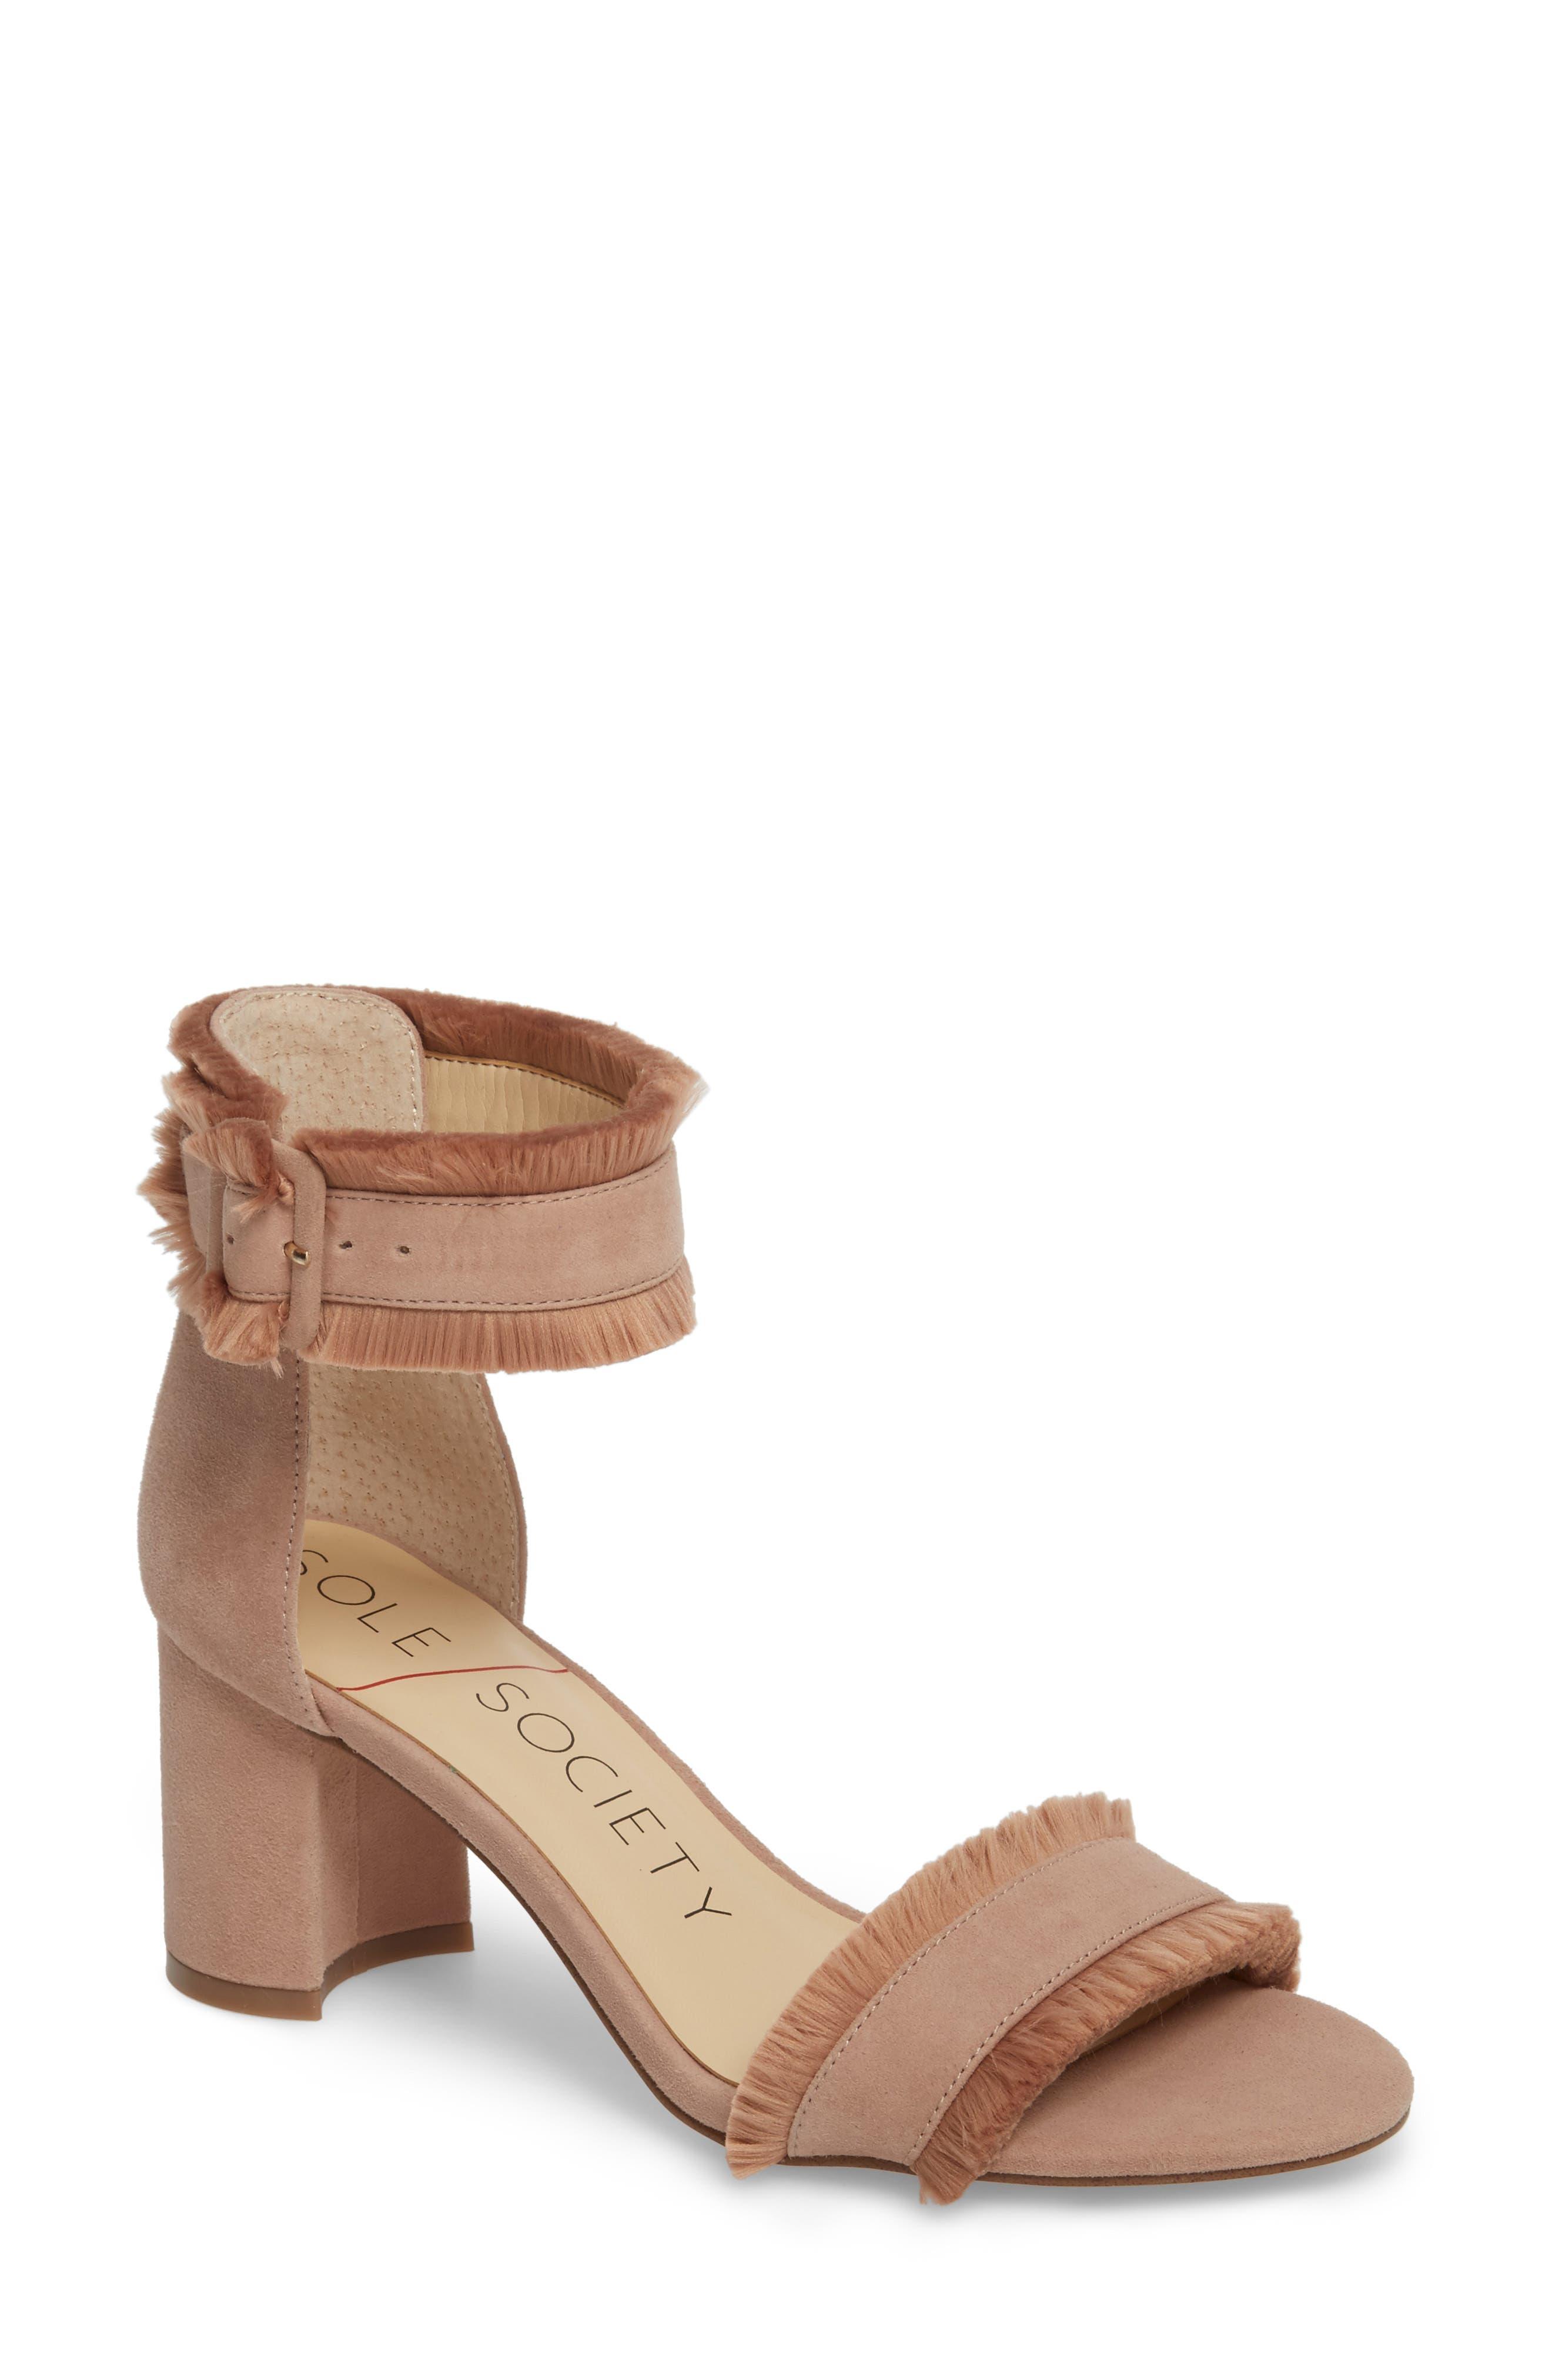 Helgah Fringe Sandal,                         Main,                         color, Dusty Rose